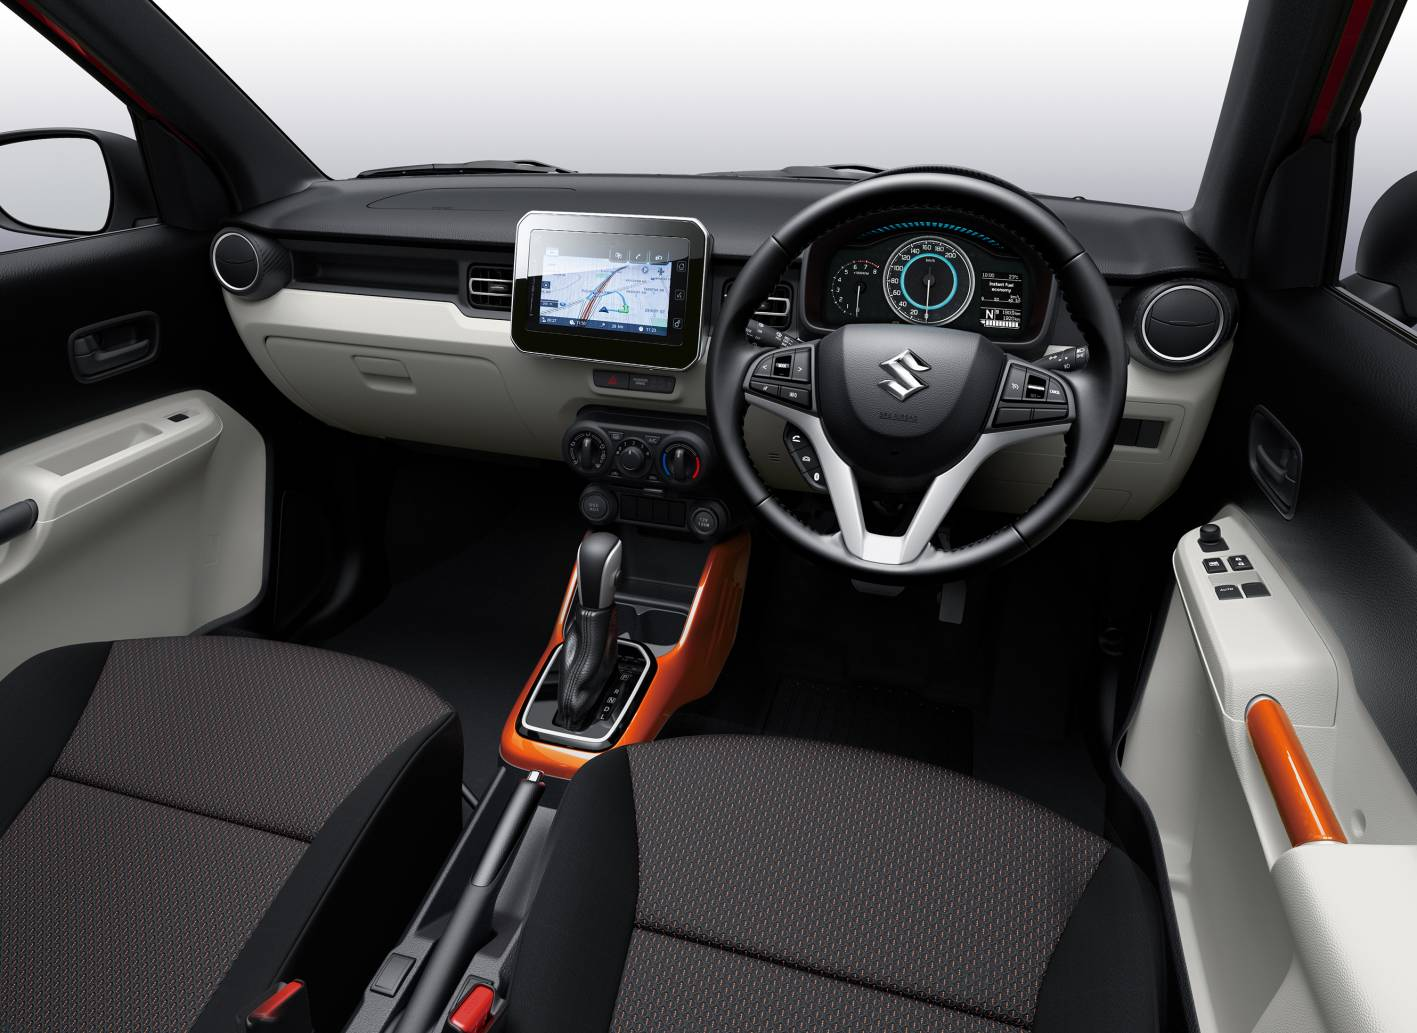 Suzuki Vitara Sat Nav Instructions